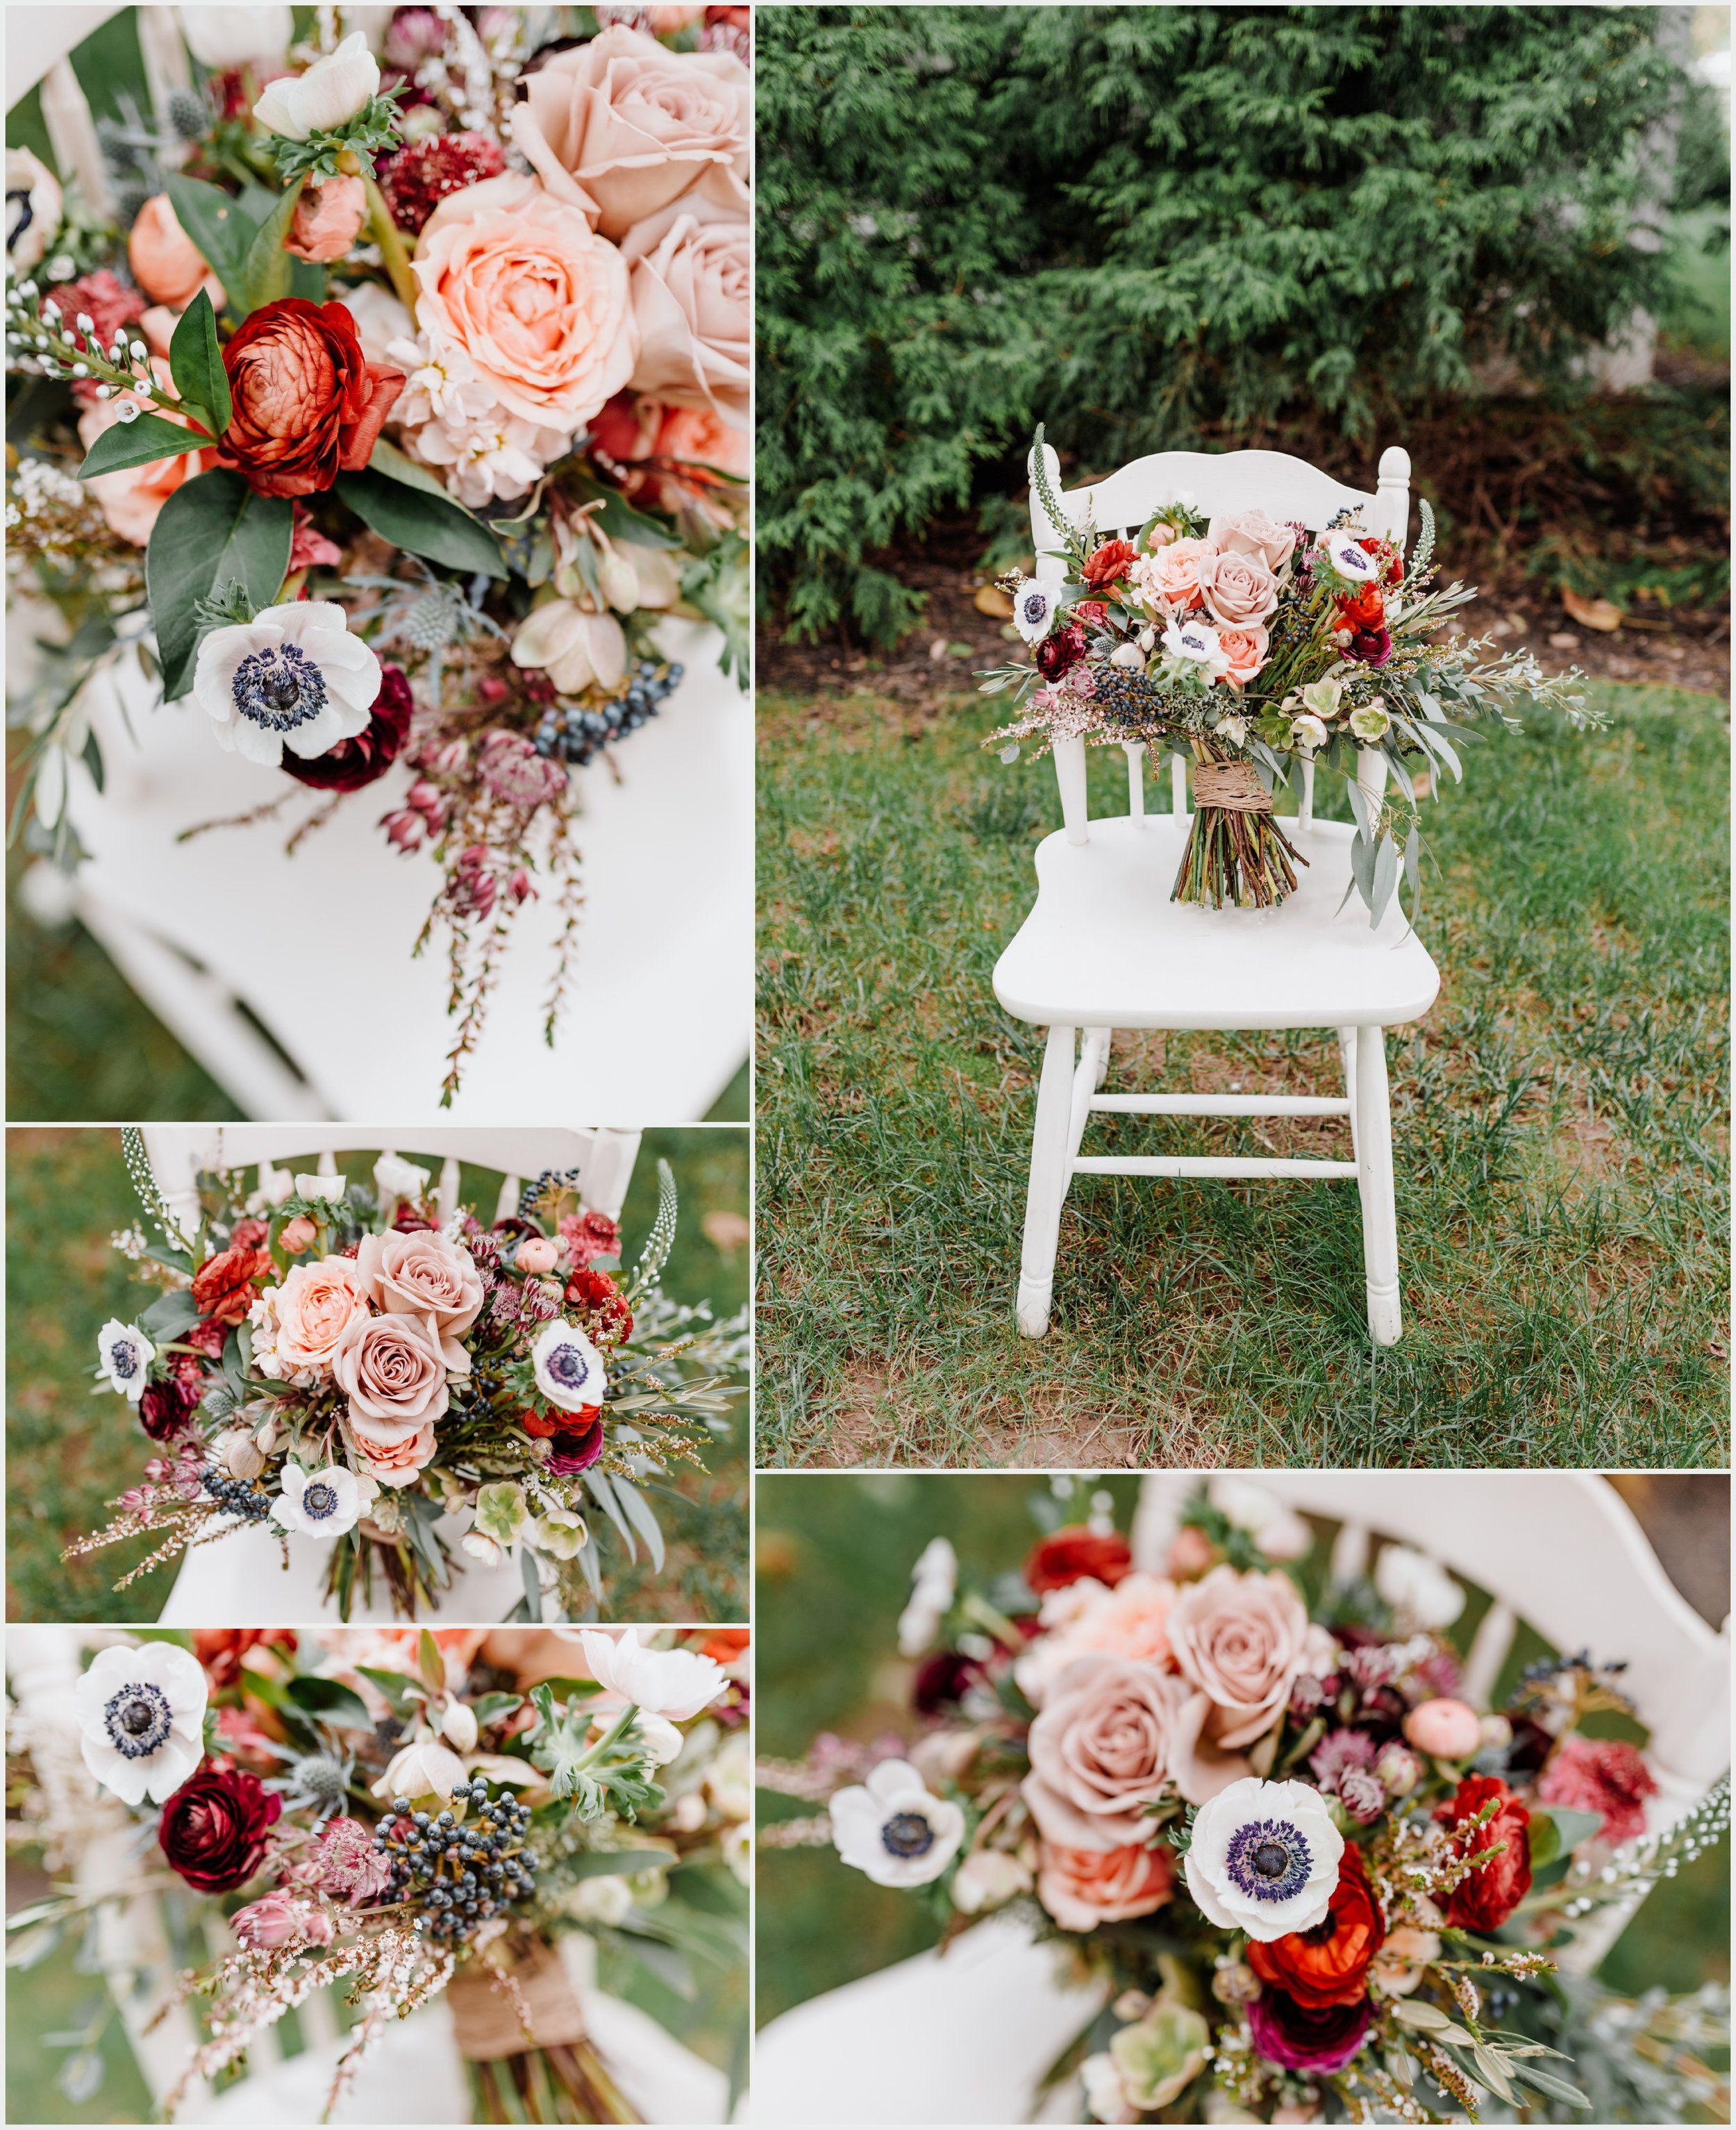 Wedding Flowers Lancaster Pa: Wedding Flowers, Bouquet Design, Heart